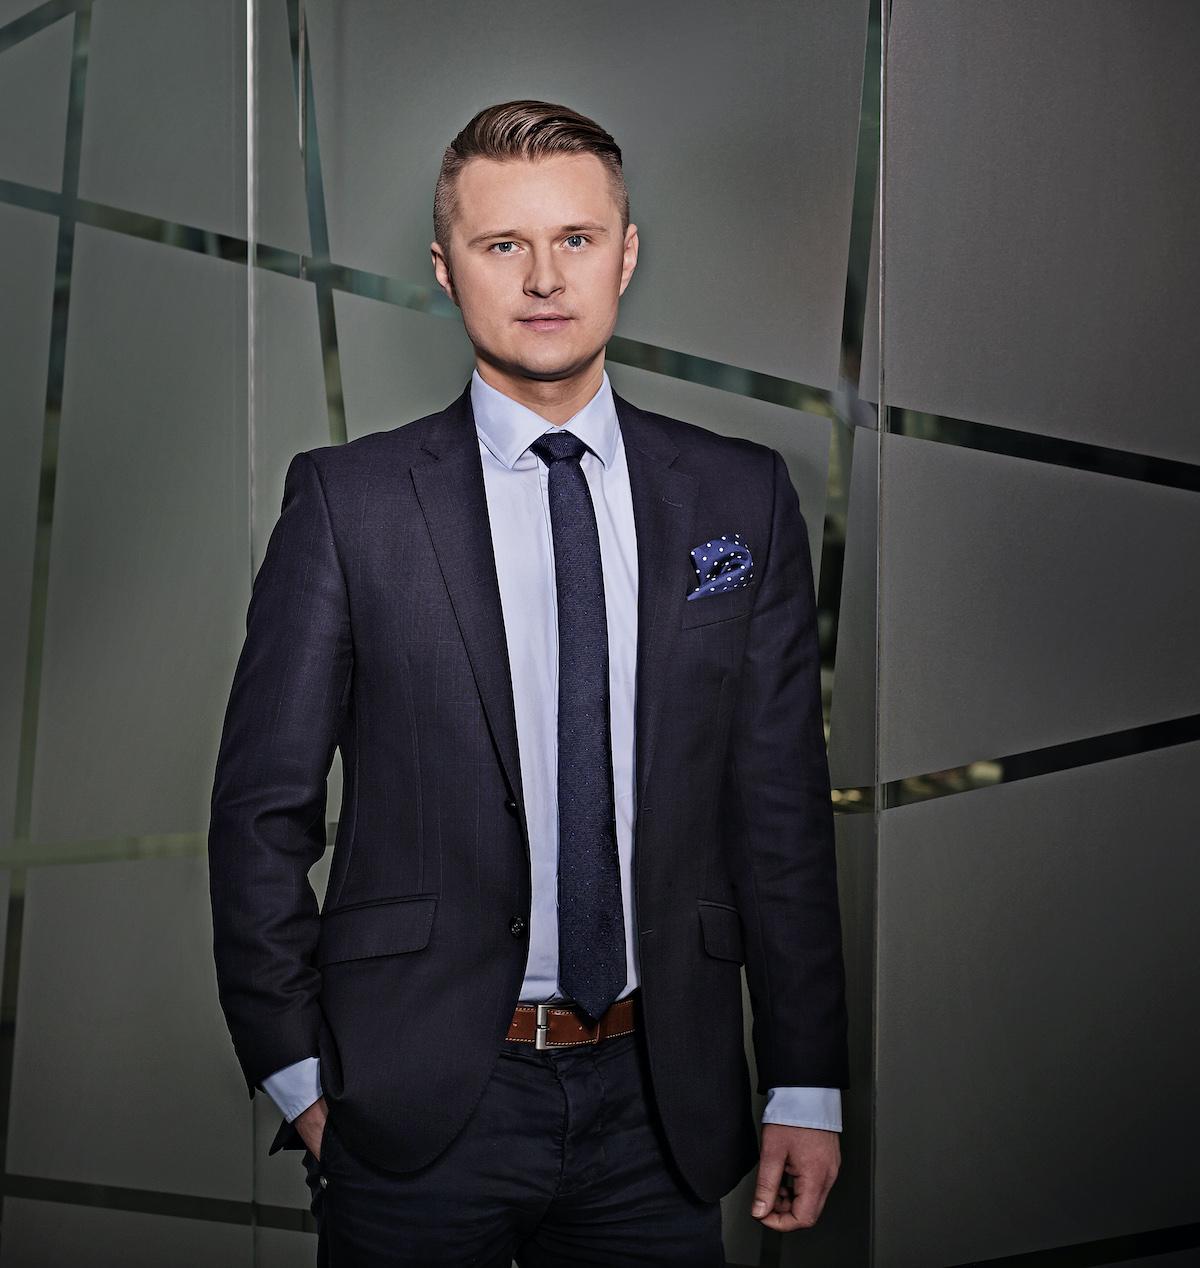 Vítězslav Pelc